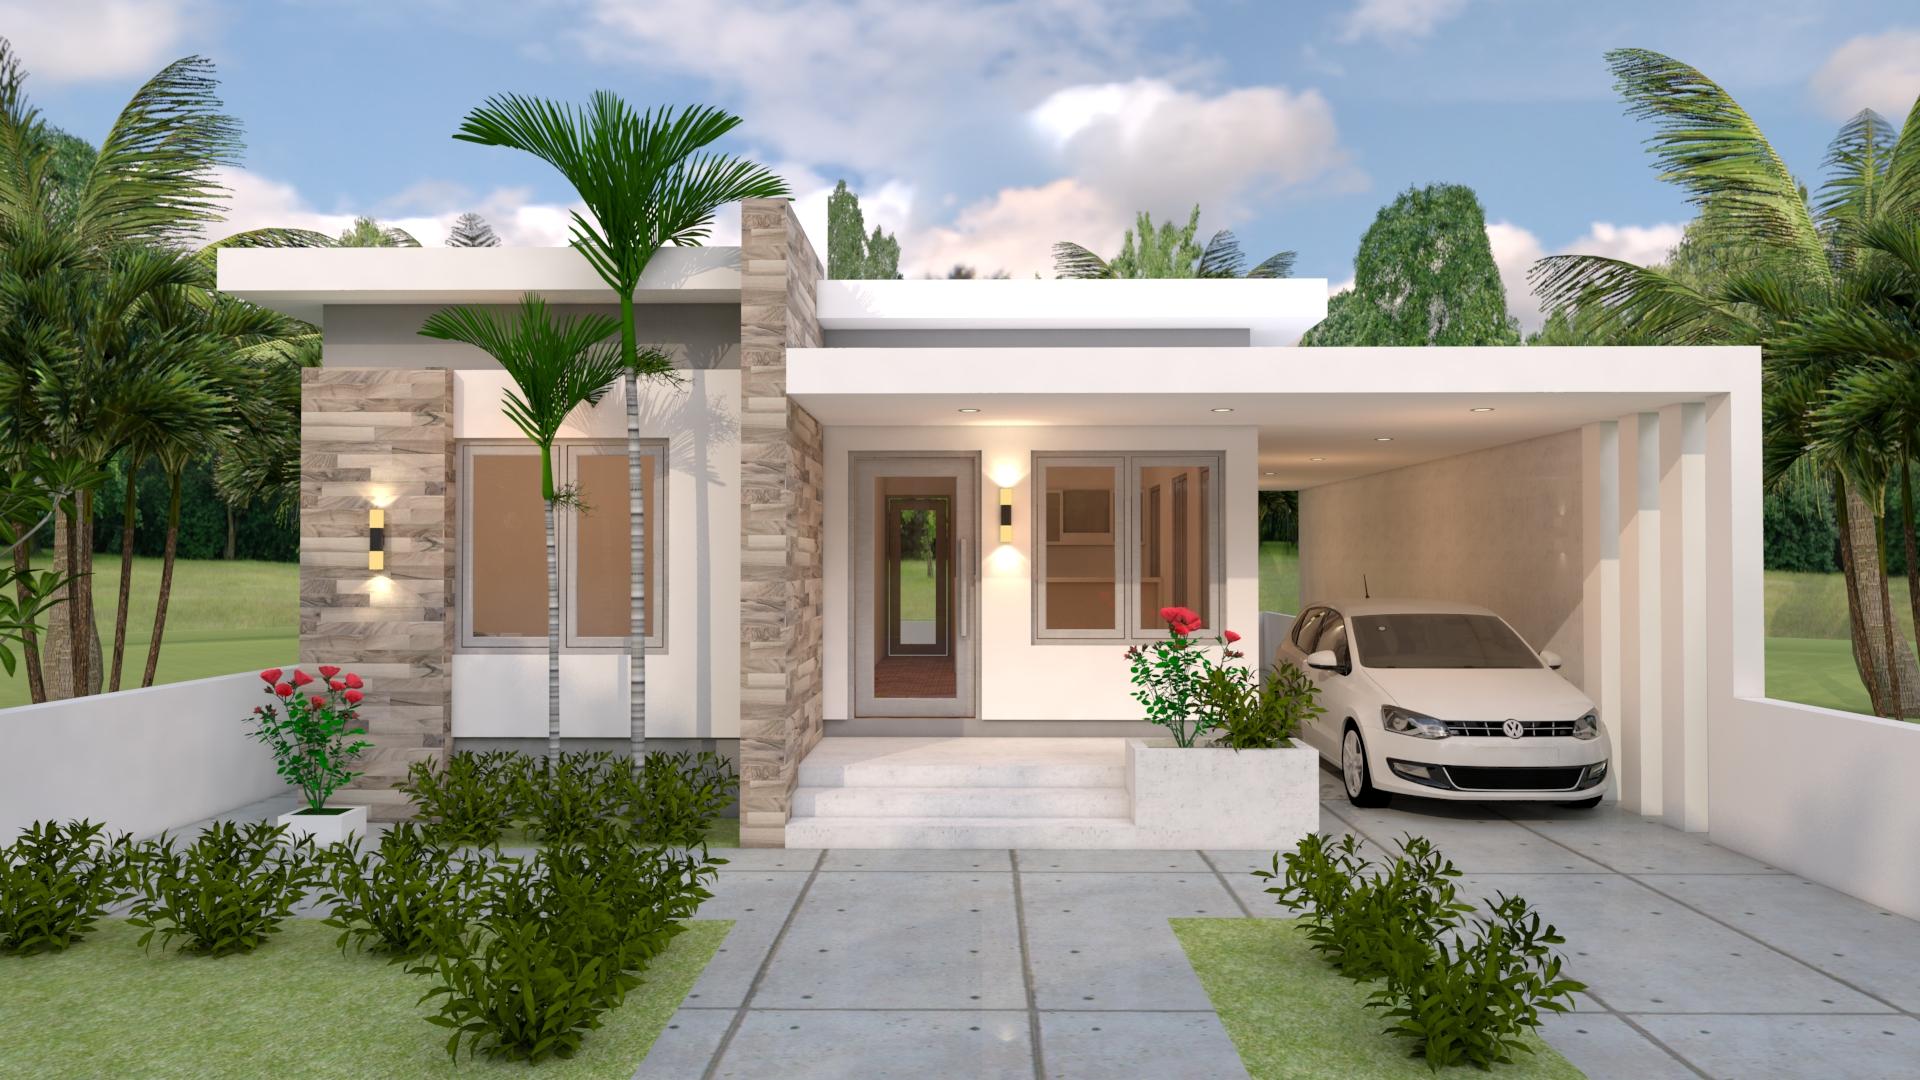 House Layout Design 10x13 Meter 33x43 Feet 3 Beds 1